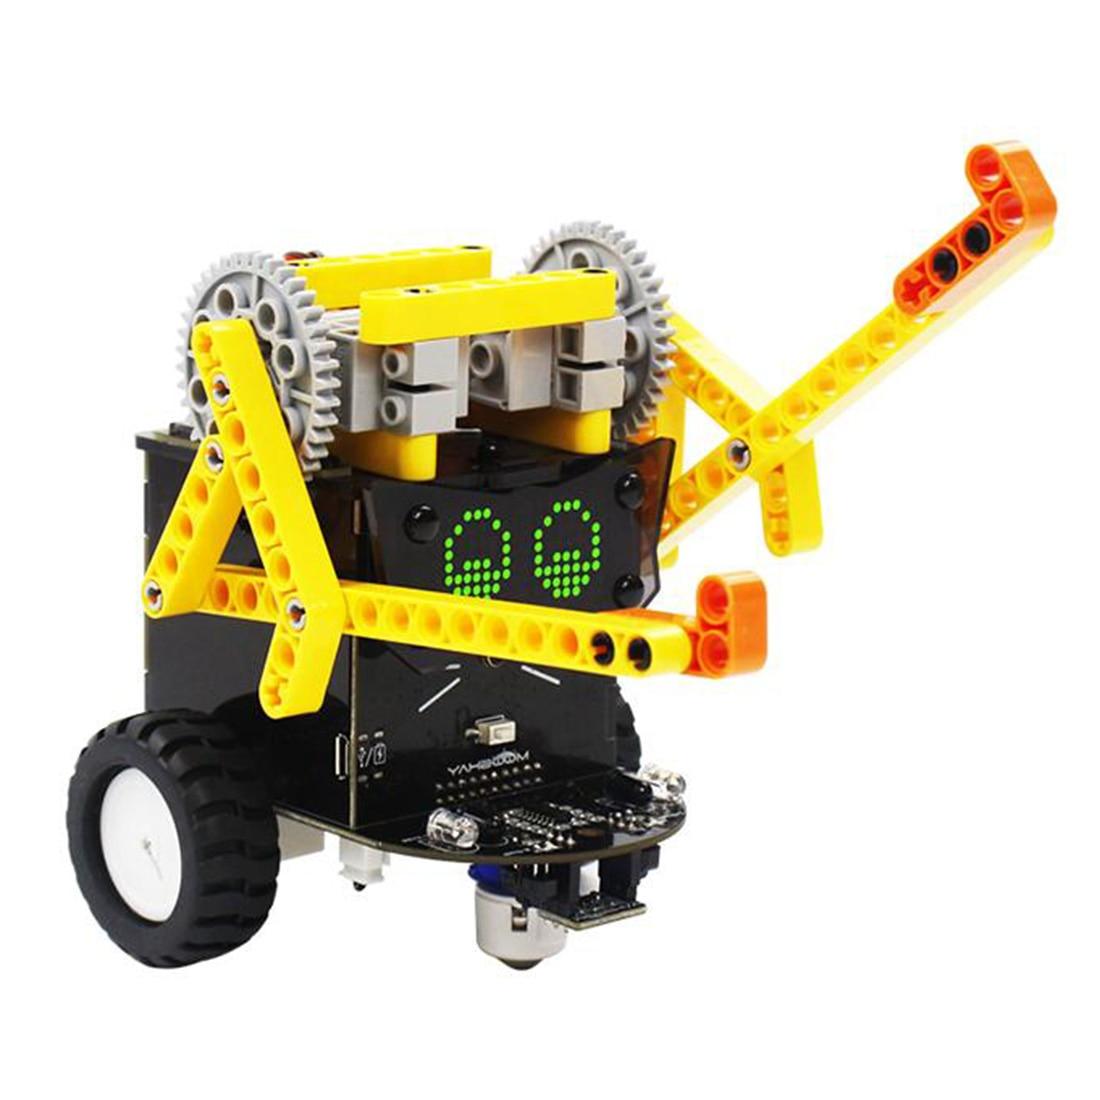 New Creative Fighting Version Omibox Scratch Programmable Robot Car Electronic DIY Stem Toy Gift Kit